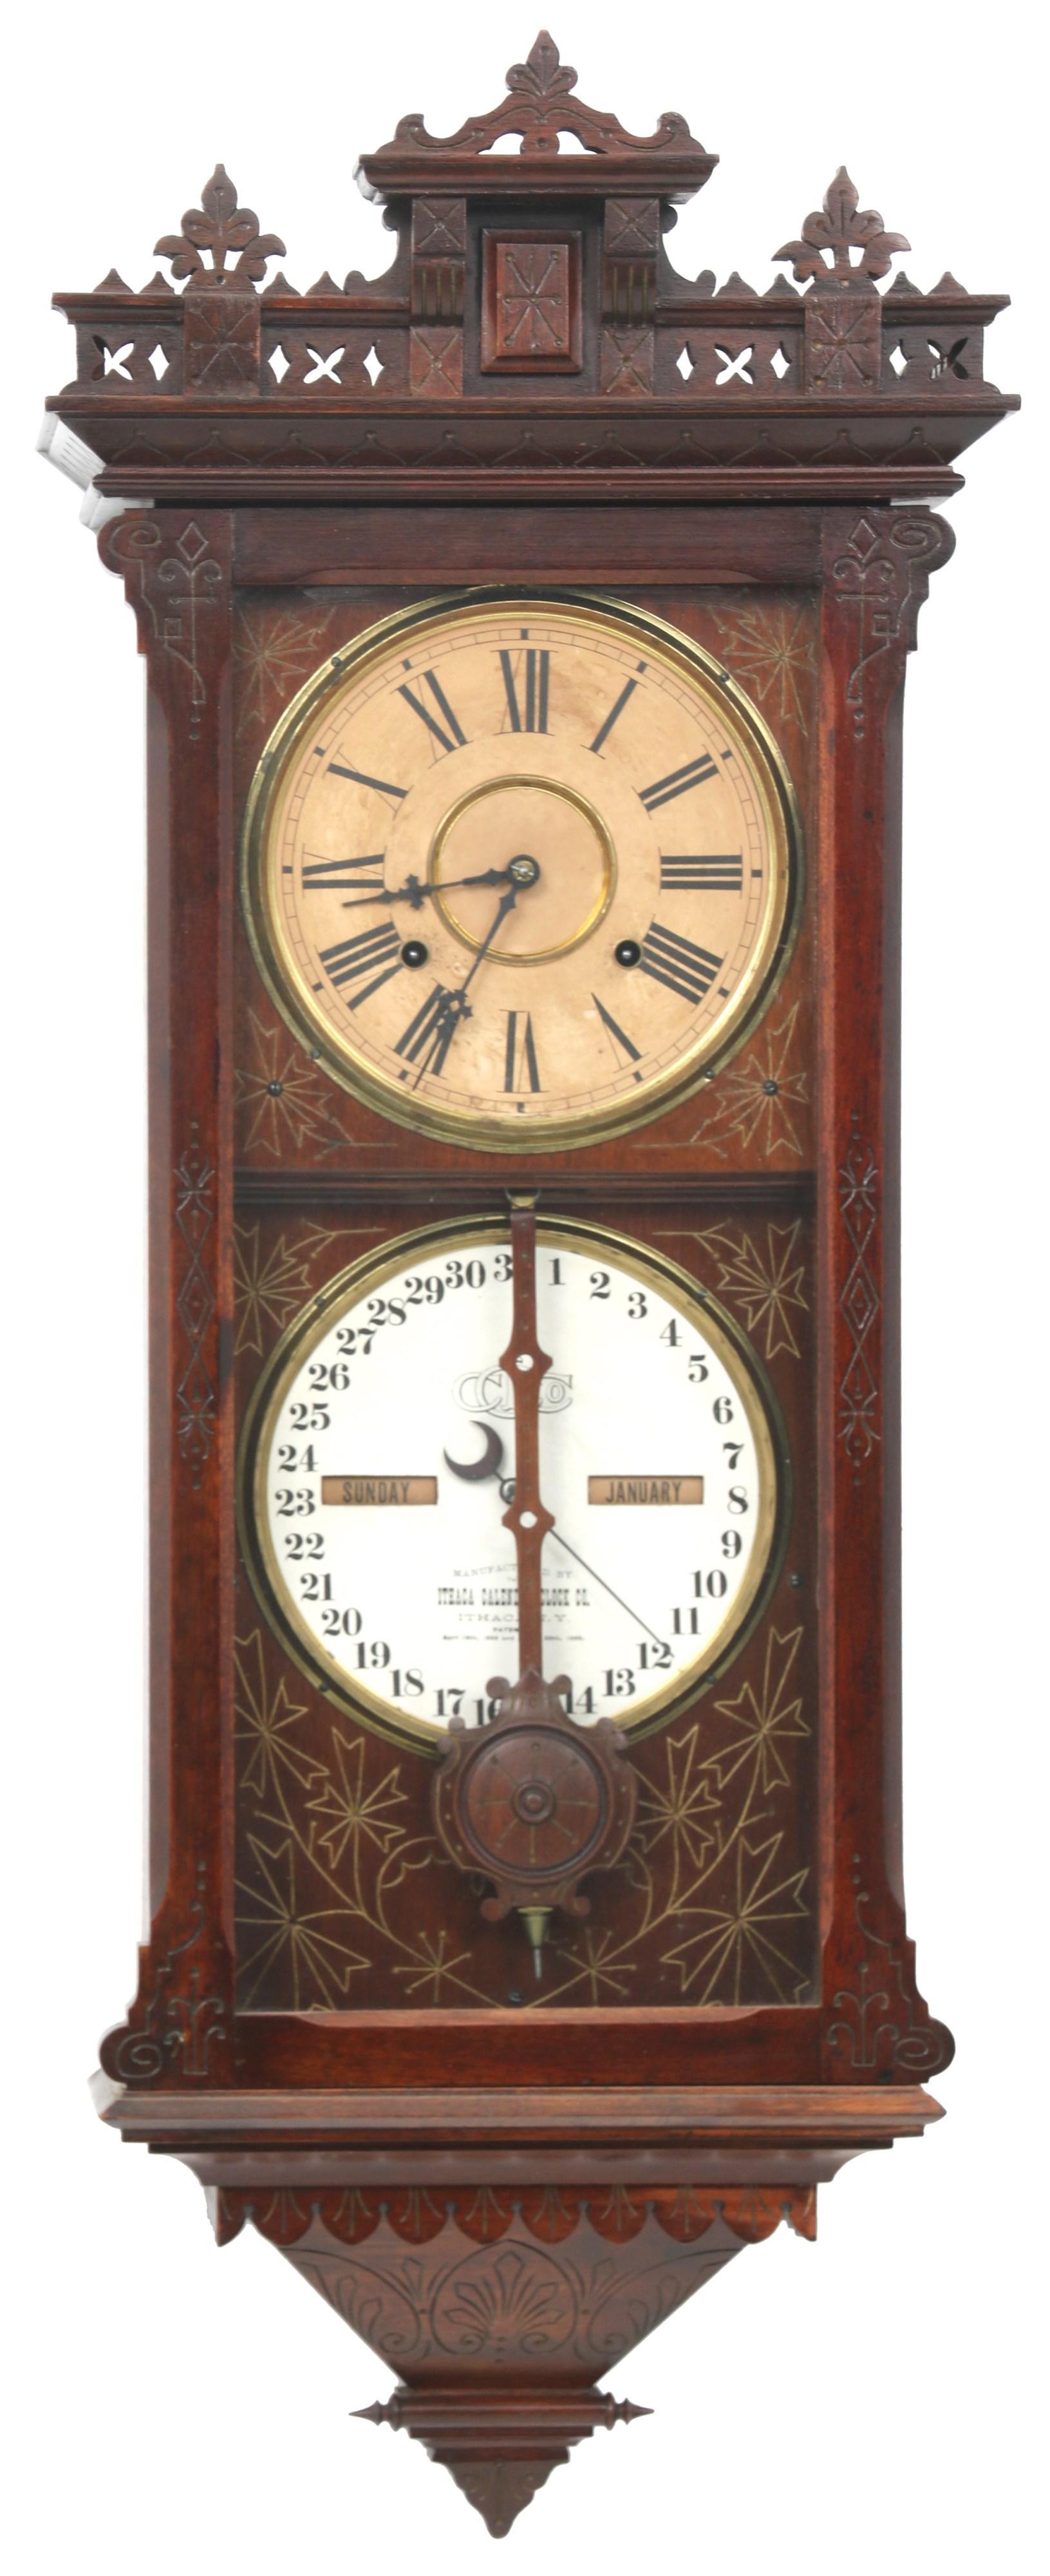 Ithaca No. 5 1/2 Hanging Belgrade Calendar Clock